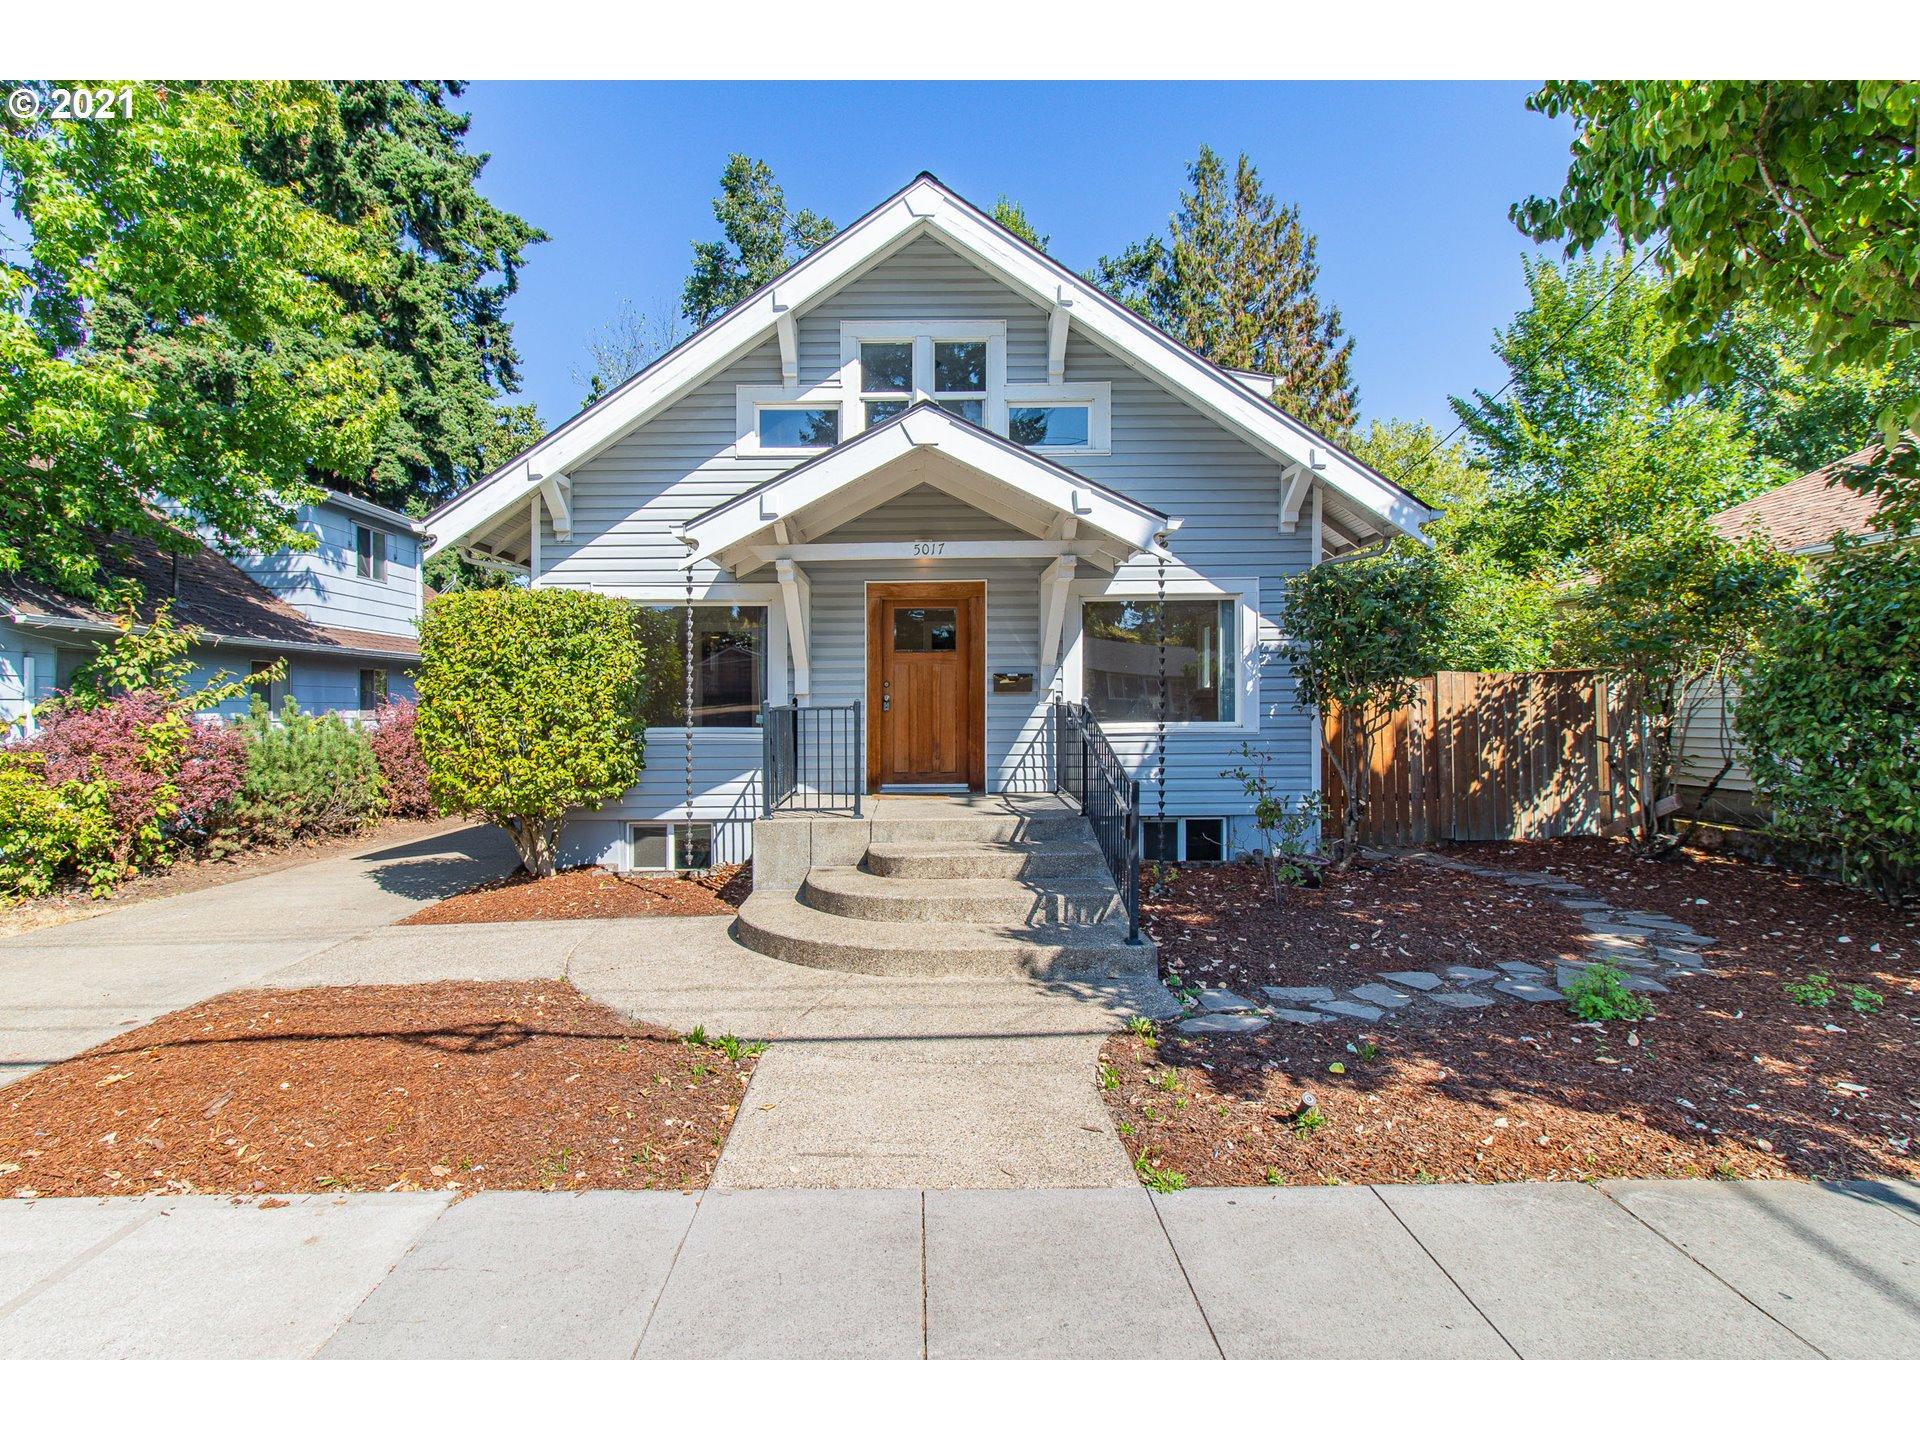 5017 SE WOODSTOCK BLVD, Portland OR 97206